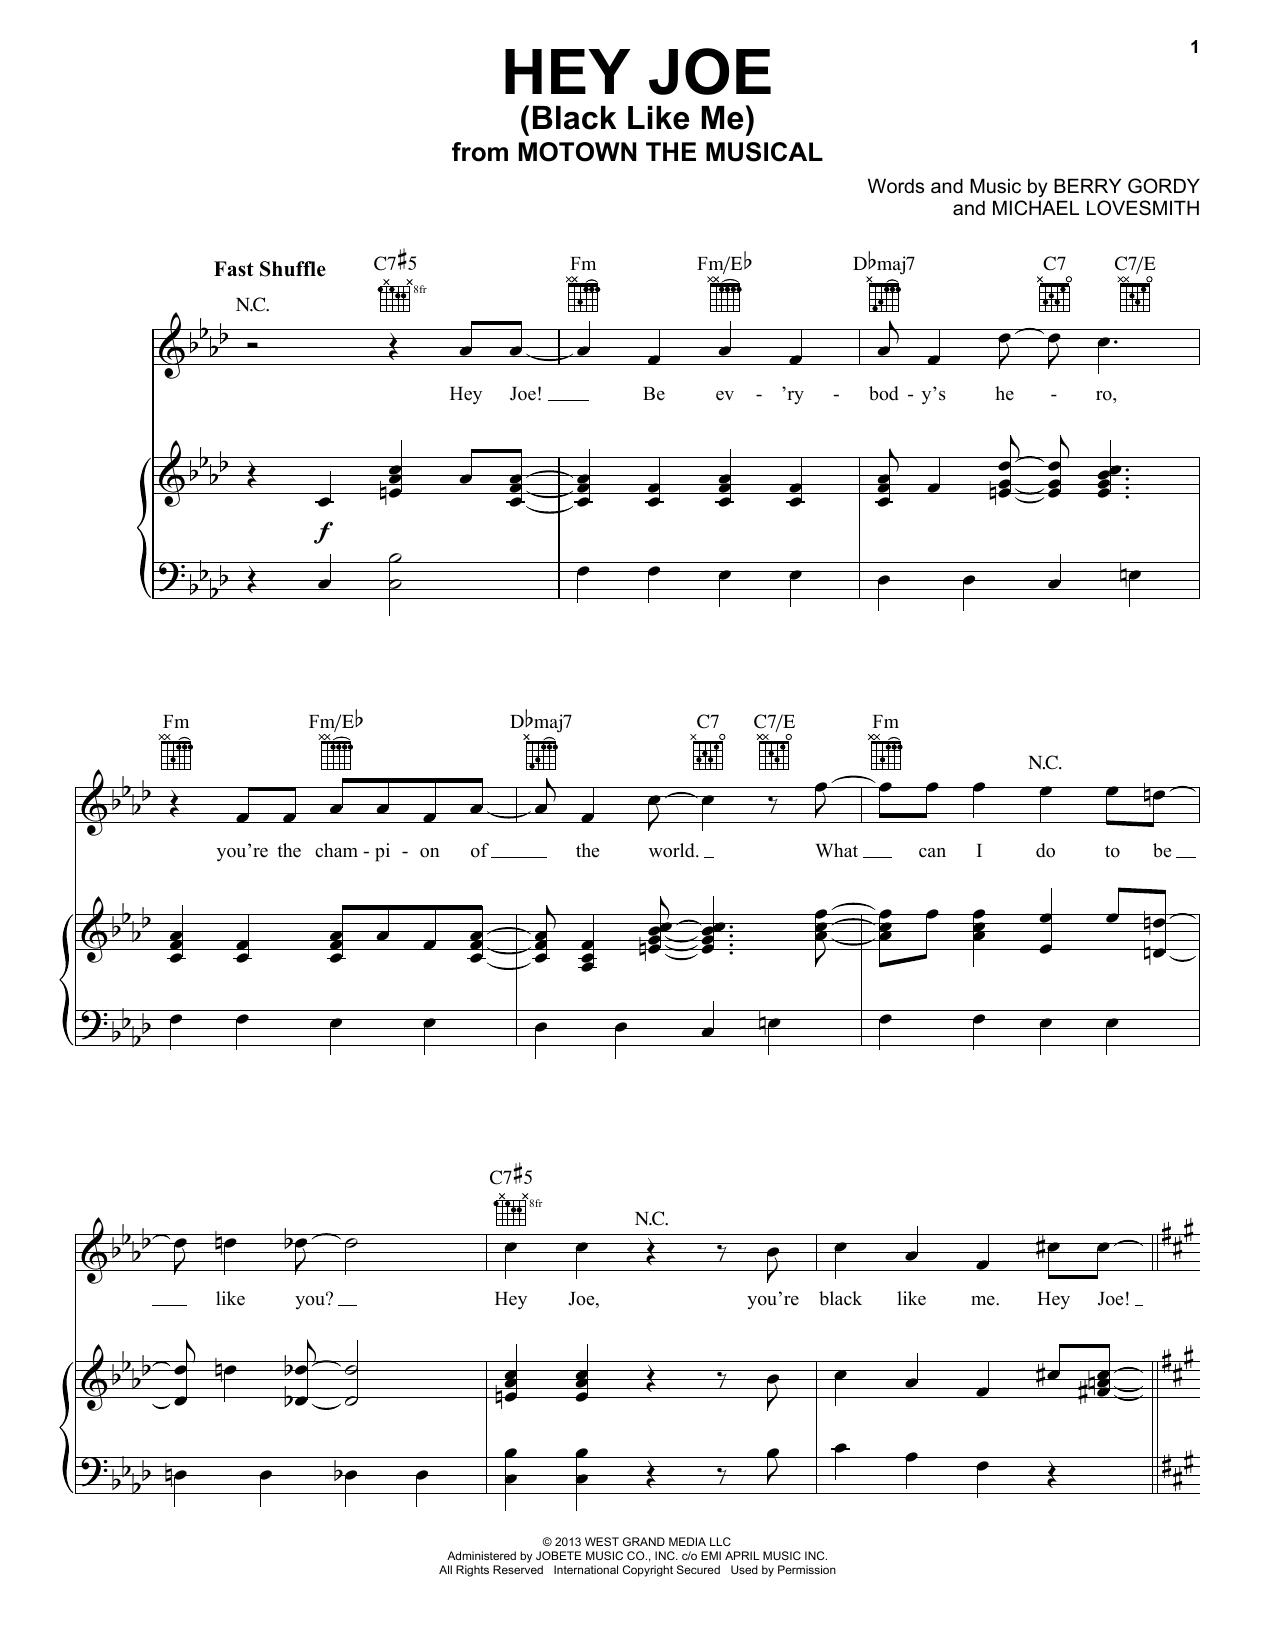 Berry Gordy Hey Joe (Black Like Me) sheet music notes and chords. Download Printable PDF.